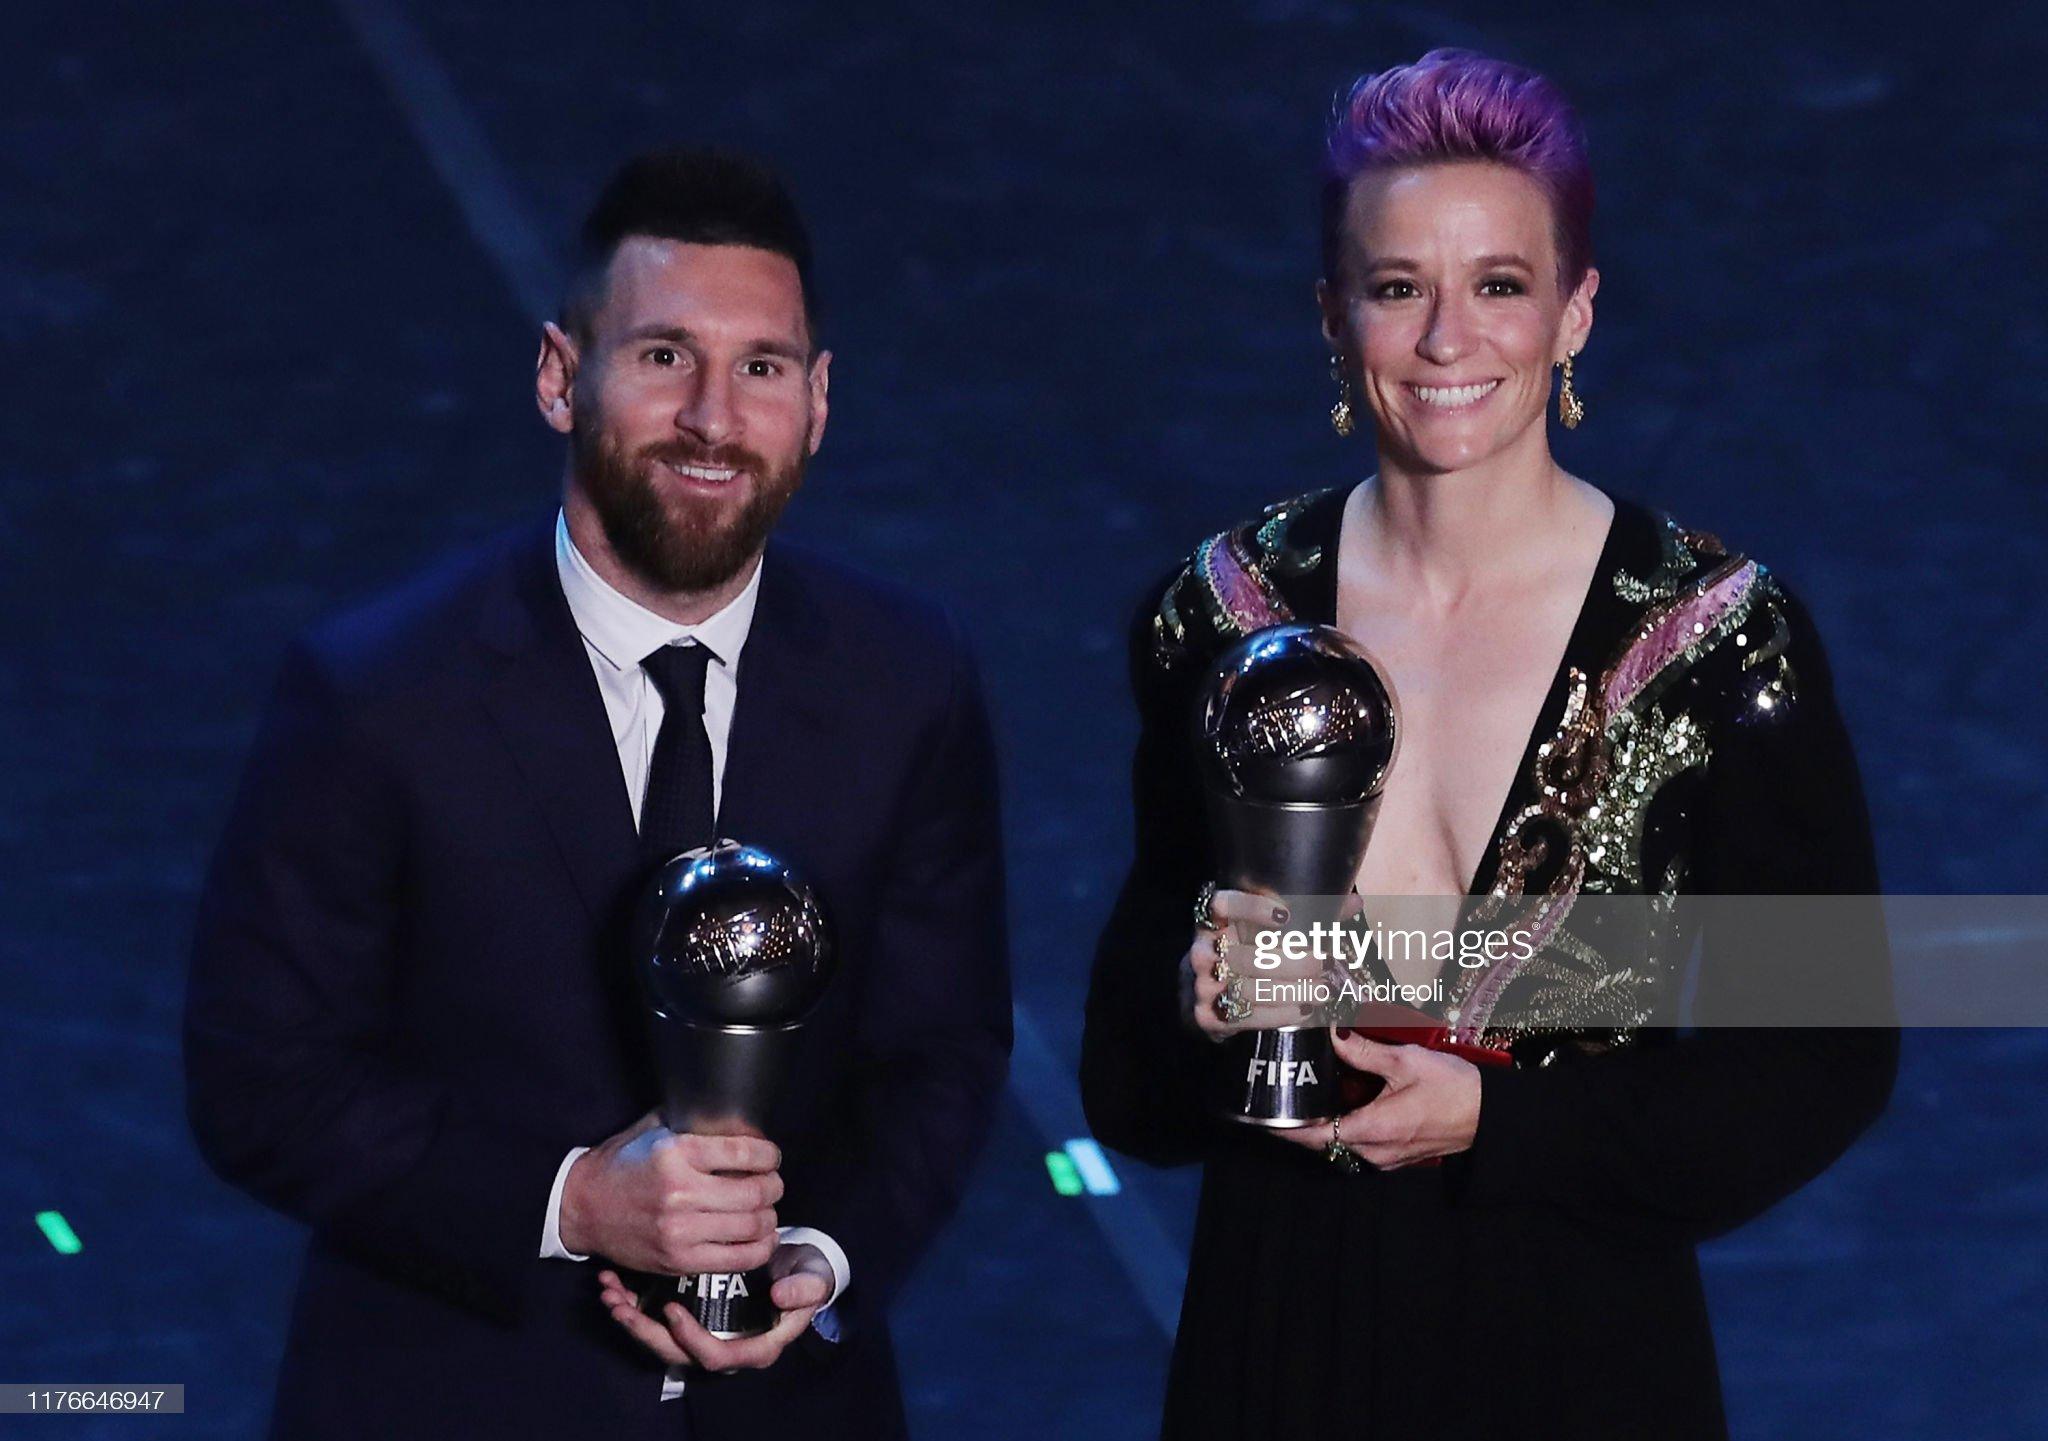 Did Lionel Messi deserve FIFA best player award?